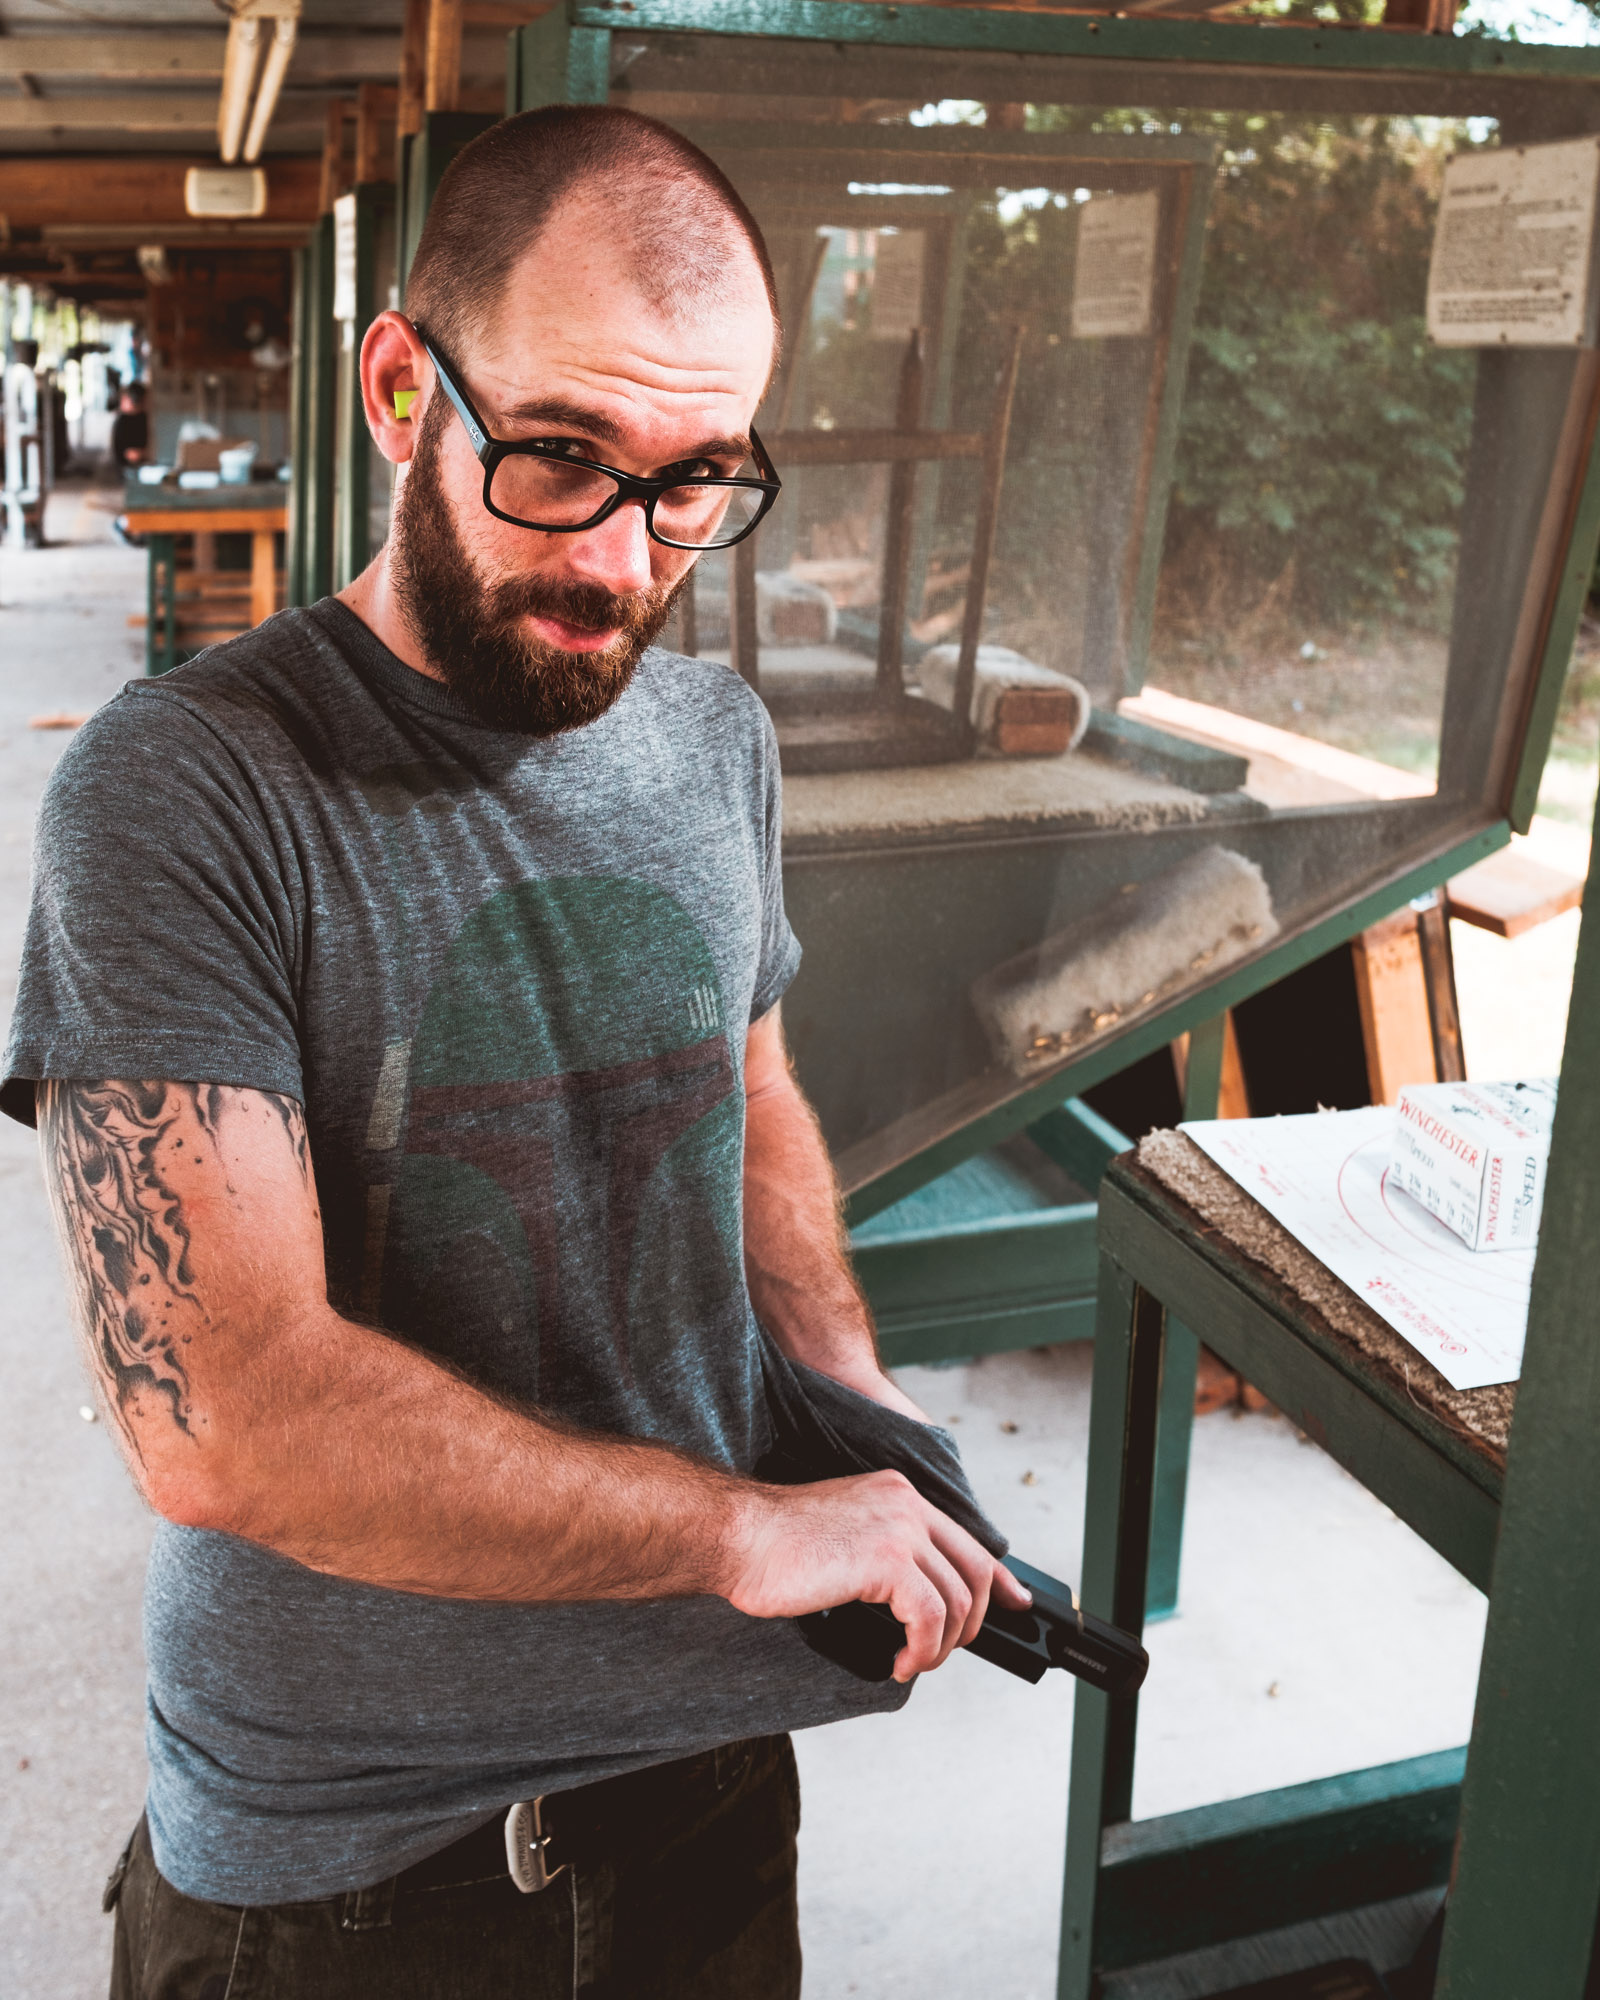 Bob Allard Glock 9mm Garland Shooting Range